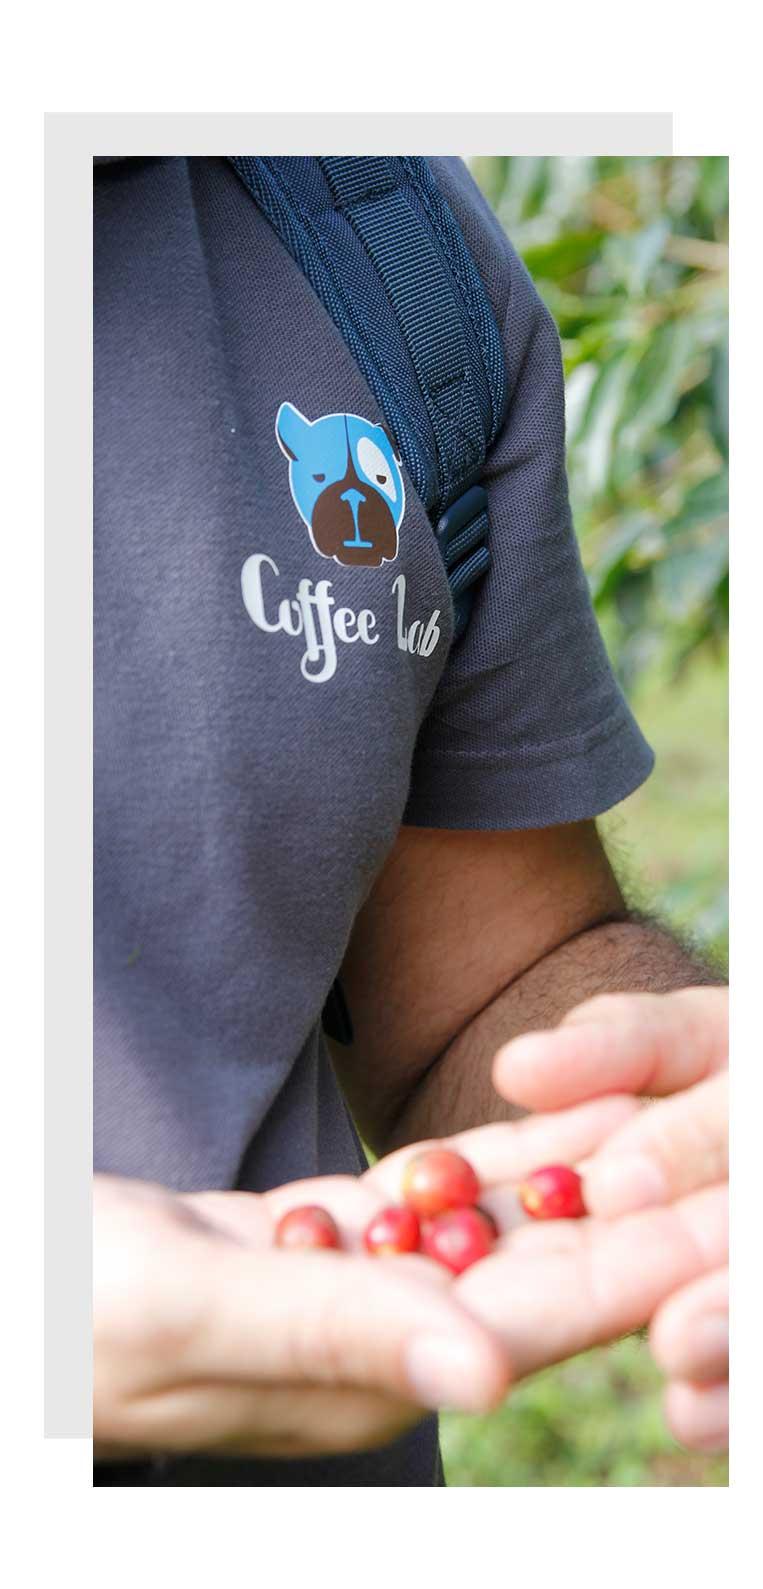 coffee-beans Coffeelab Στέλιος Ρουμελιώτης